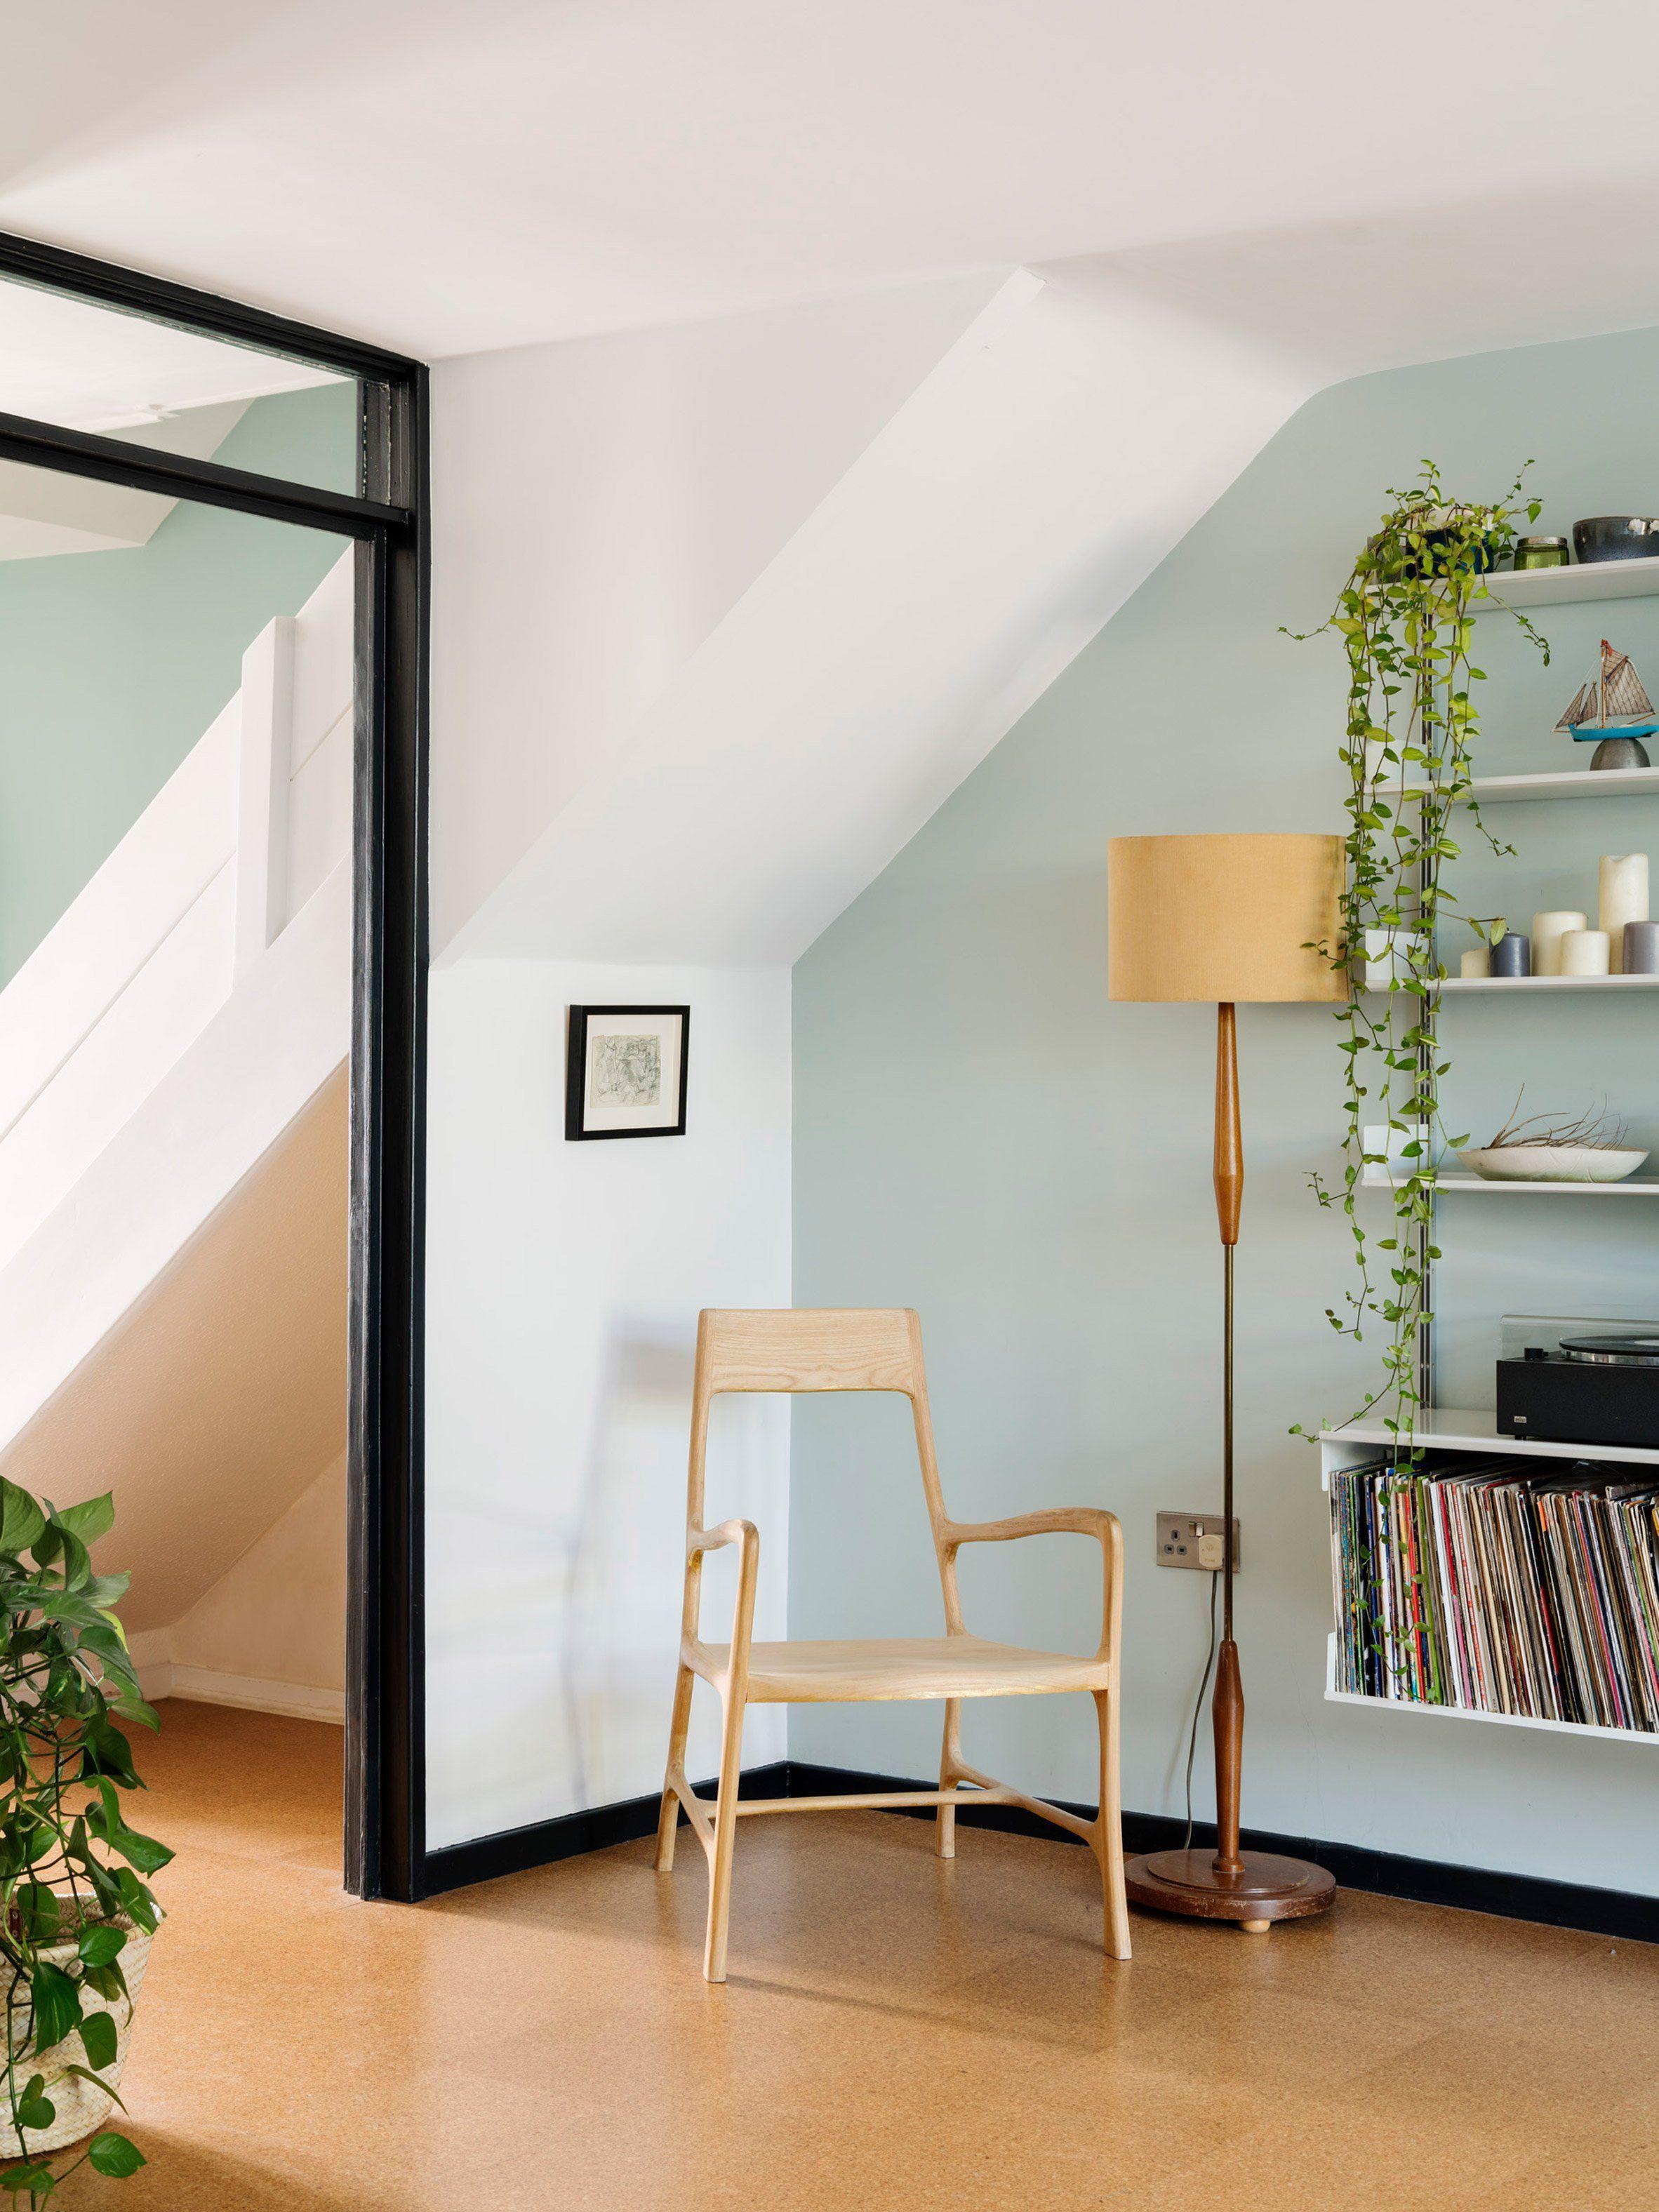 Peckham House by JAIL Make | 室内设计 | Pinterest | House, Entrance ...